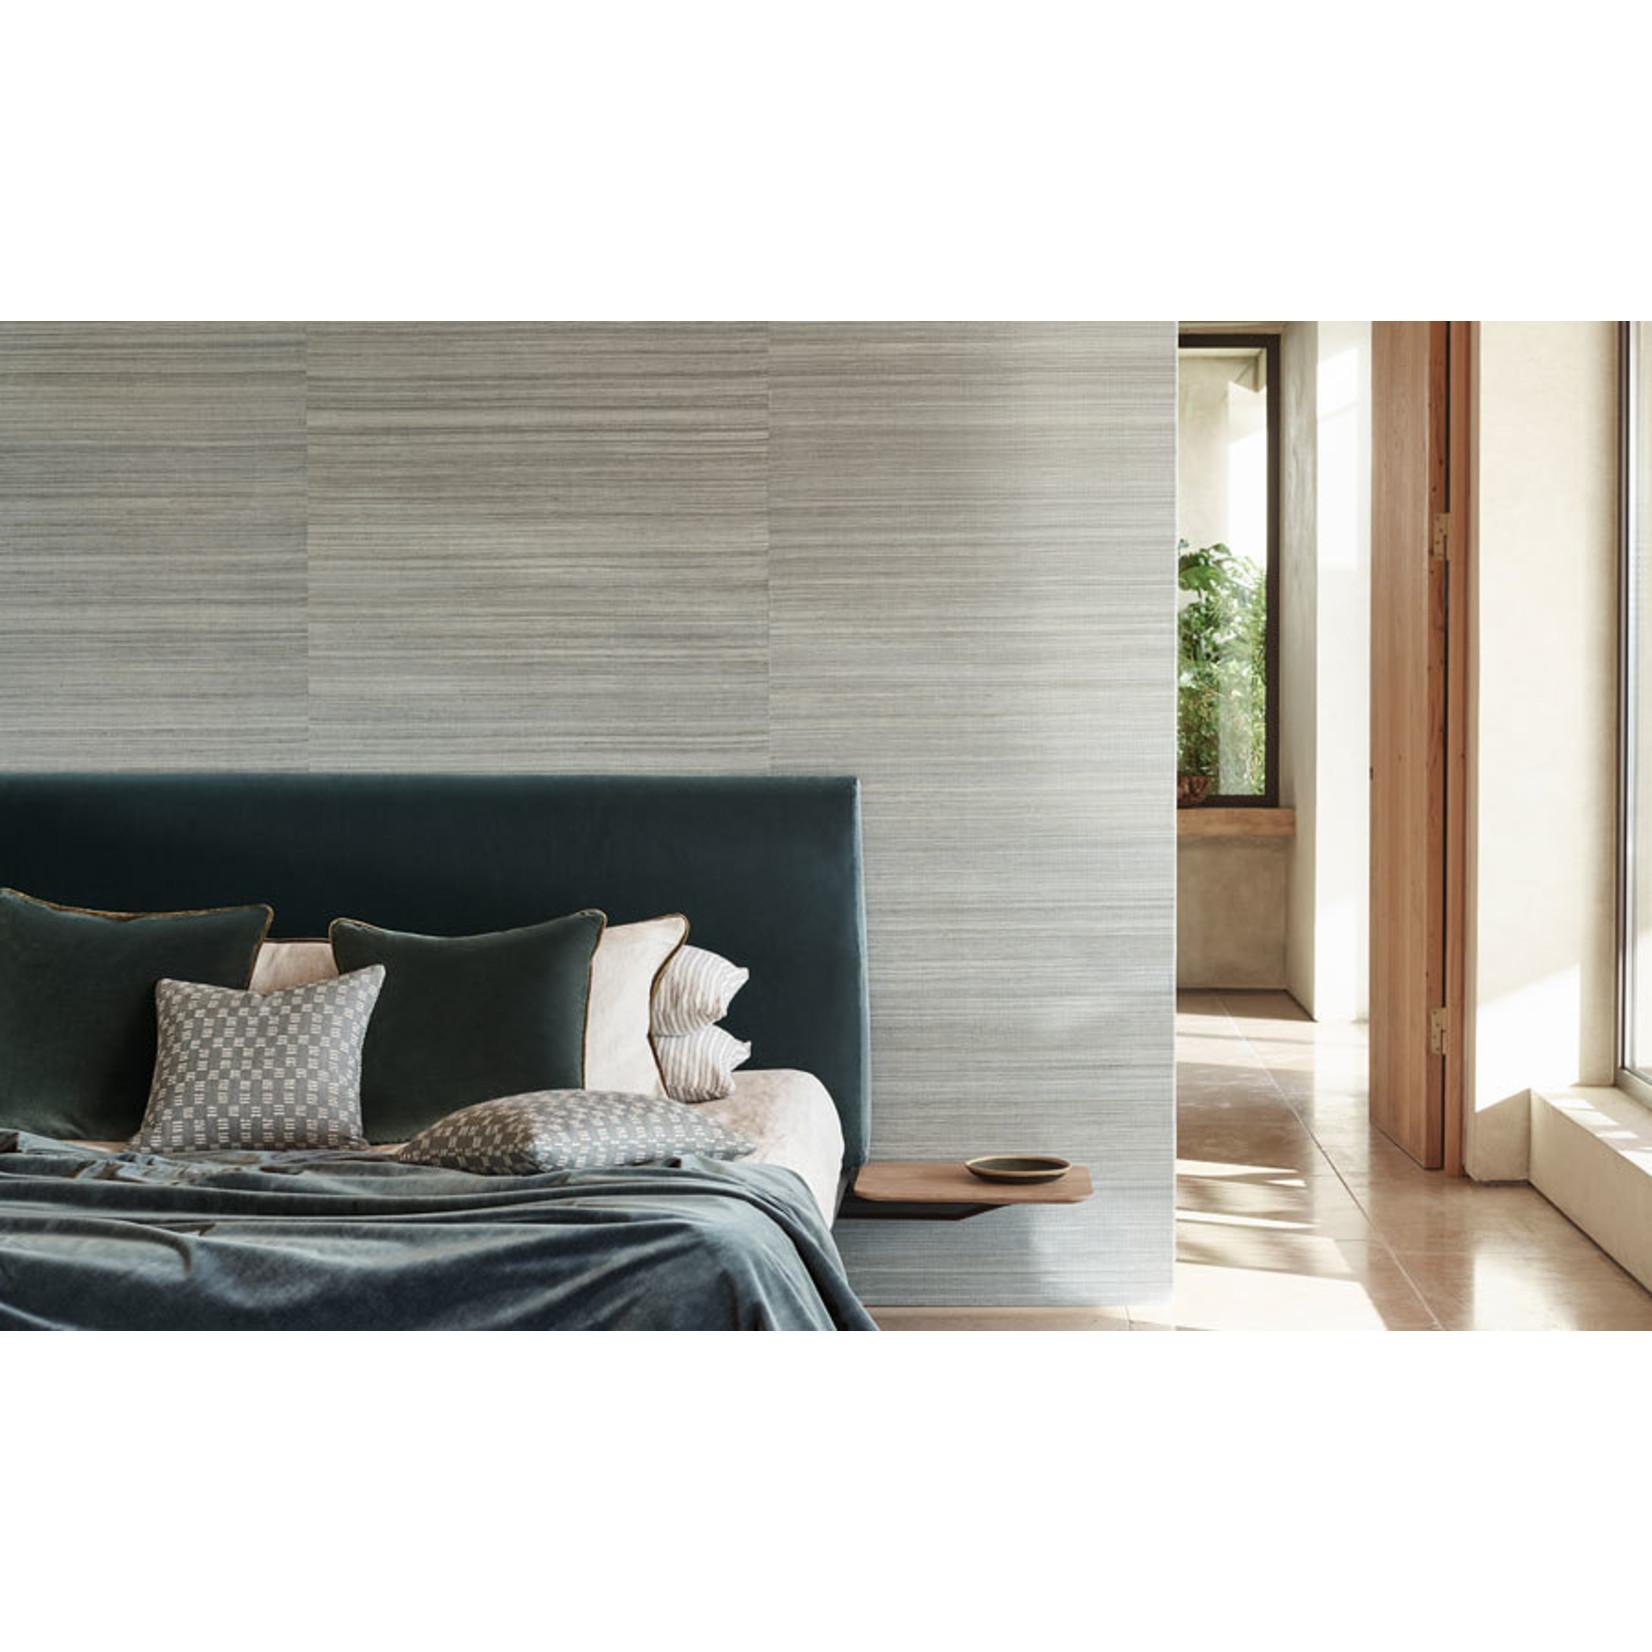 Mark Alexander Grasscloth Handwoven Wallcoverings | Duo Sisal Carbon